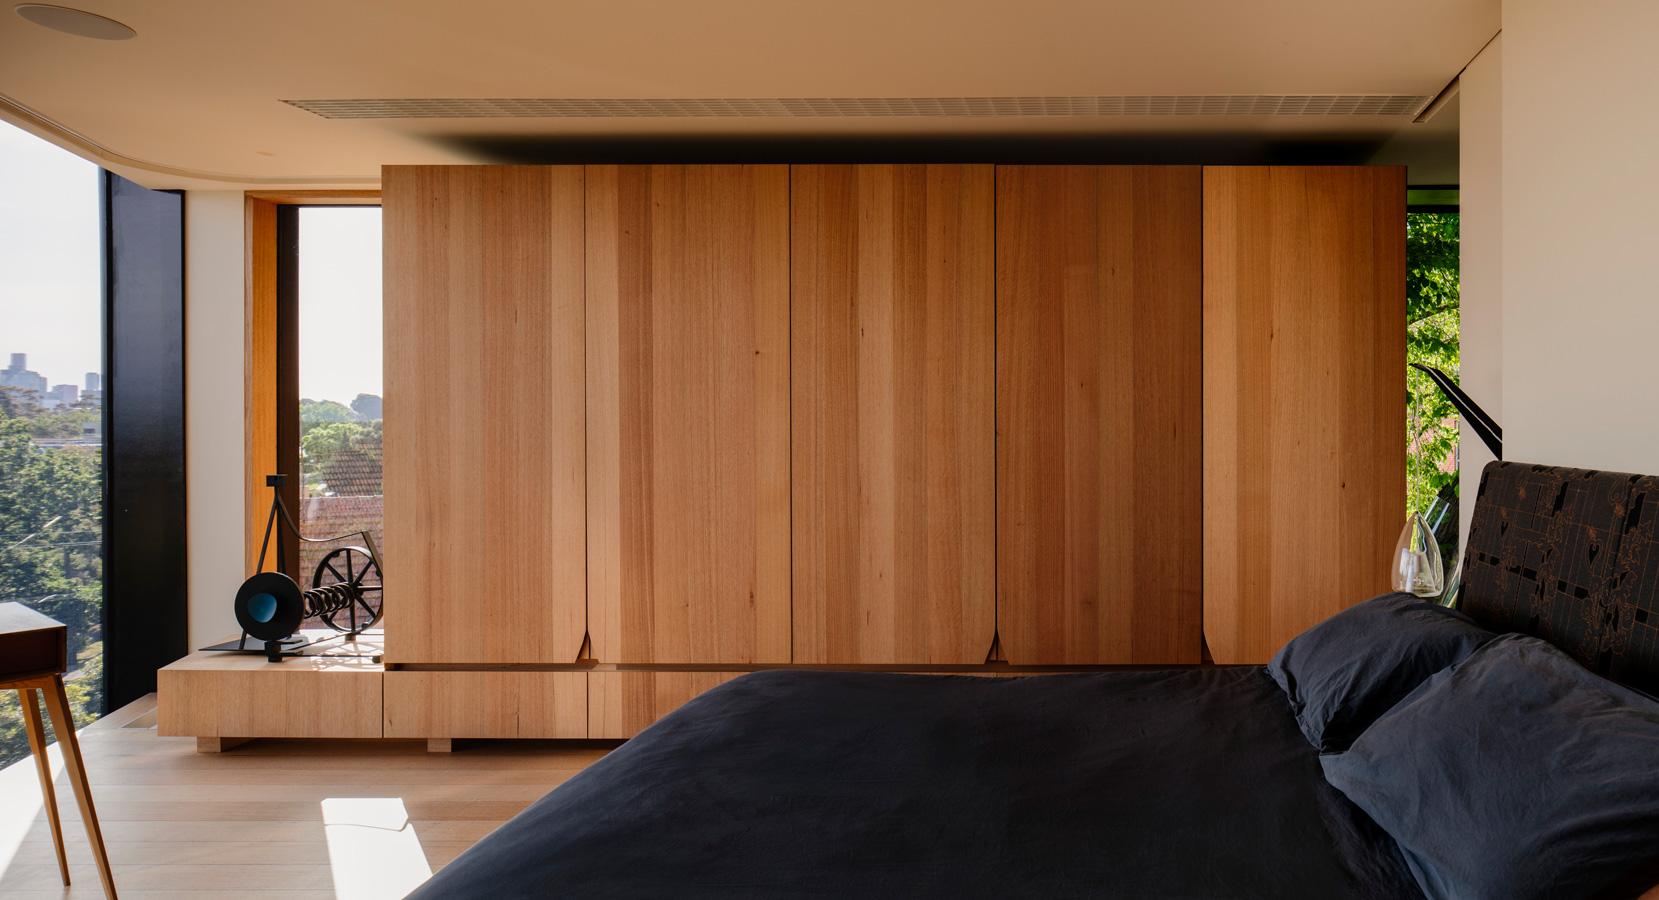 Kew Residence, John Wardle, Overend Constructions, master bedroom, custom timber wardrobe, architectural, design, joinery